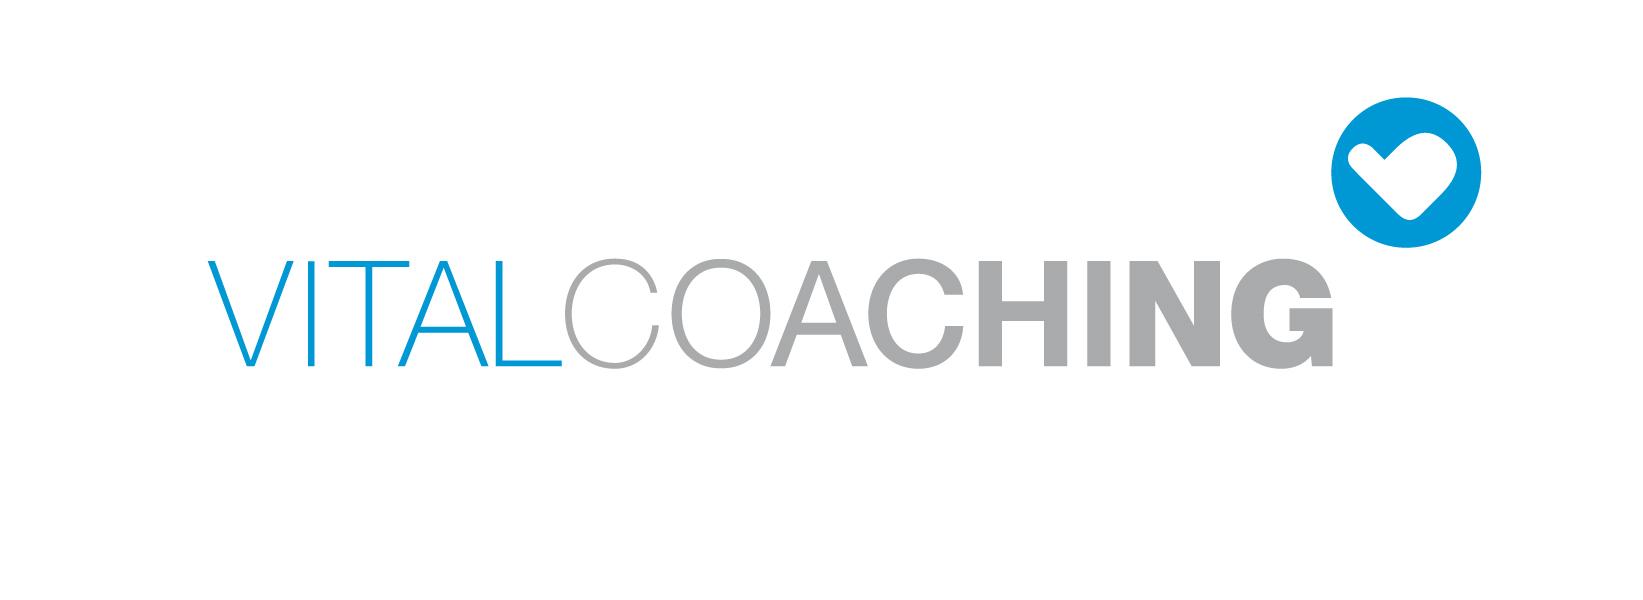 Vital Coaching Beatriz Palá Calvo